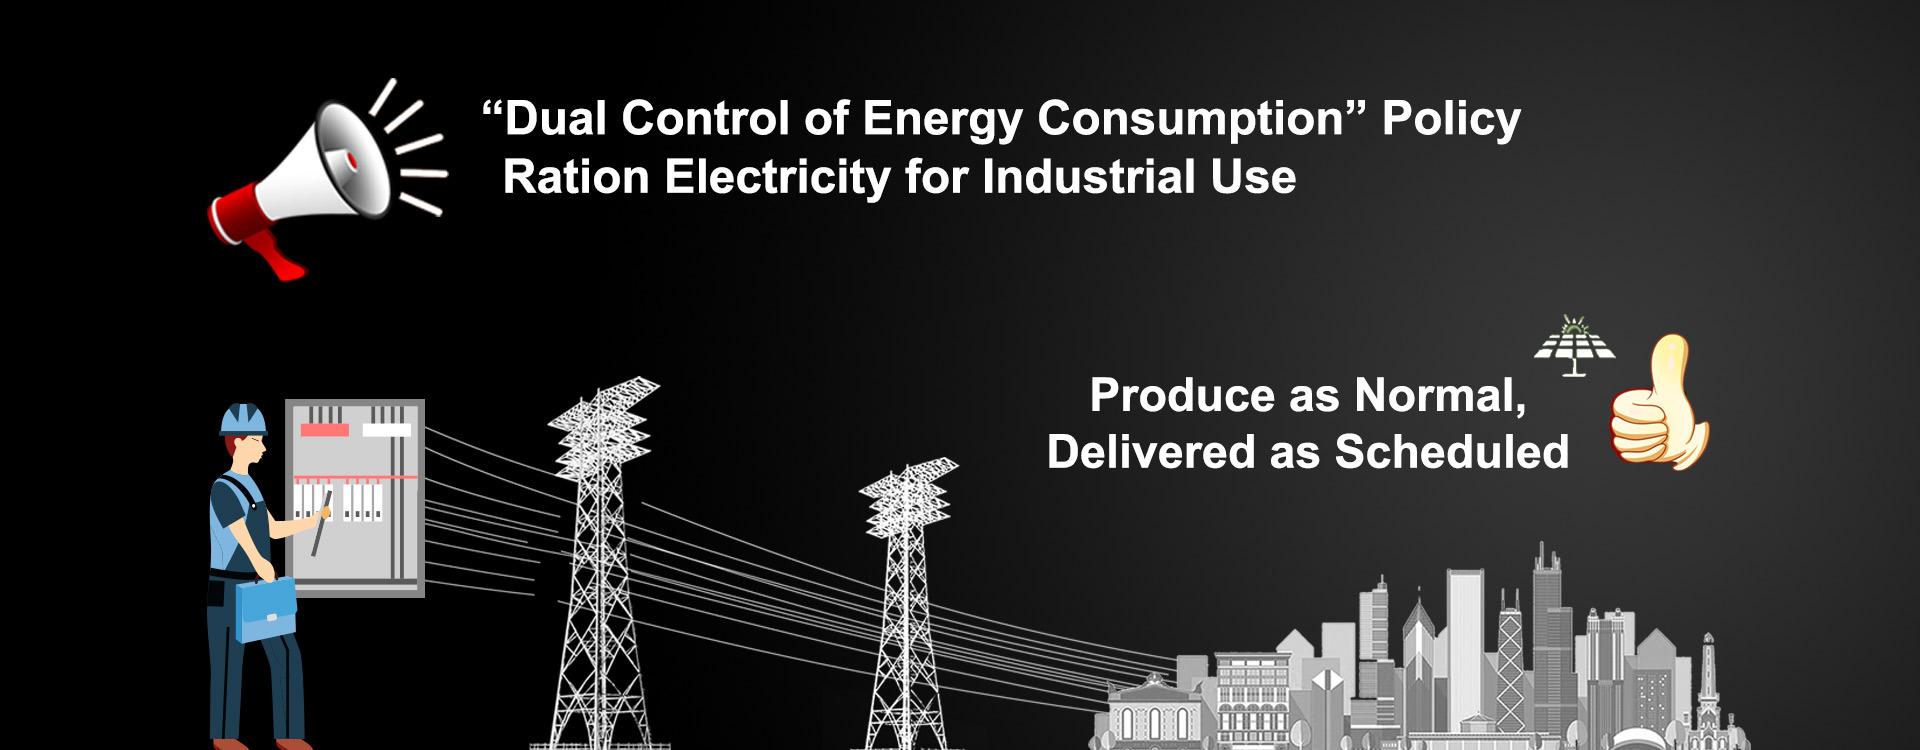 dual control, energy management, energy efficiency